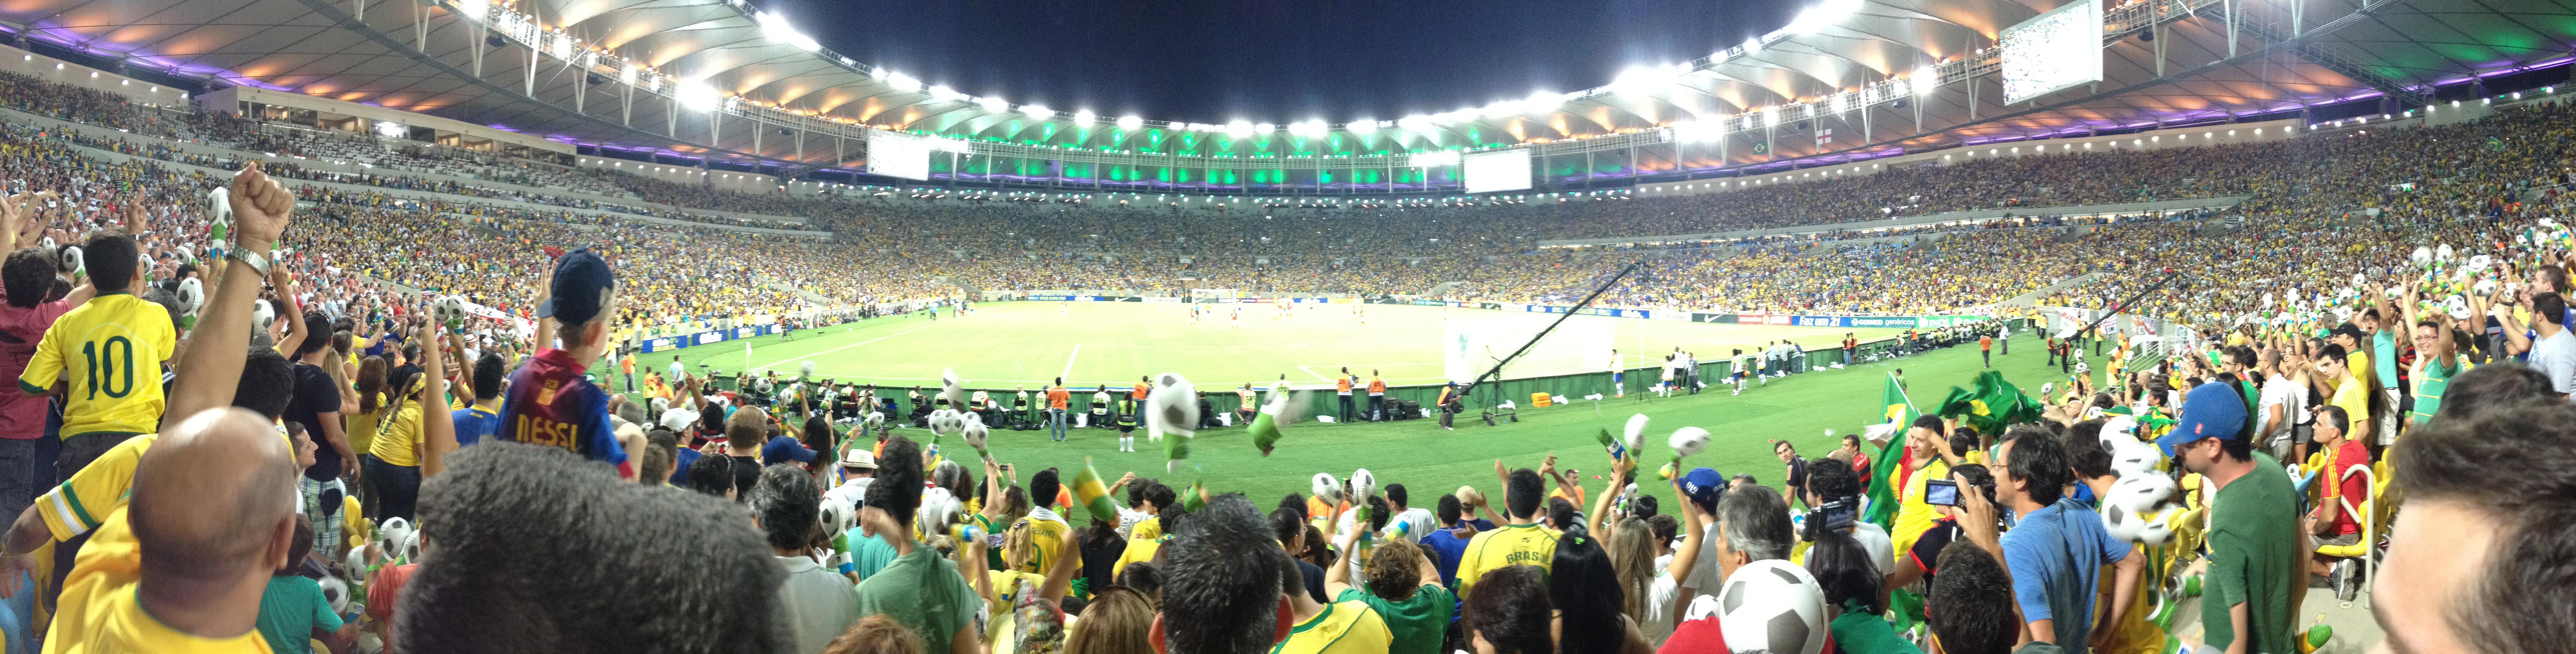 England v Brazil in Rio - Estádio do Maracanã